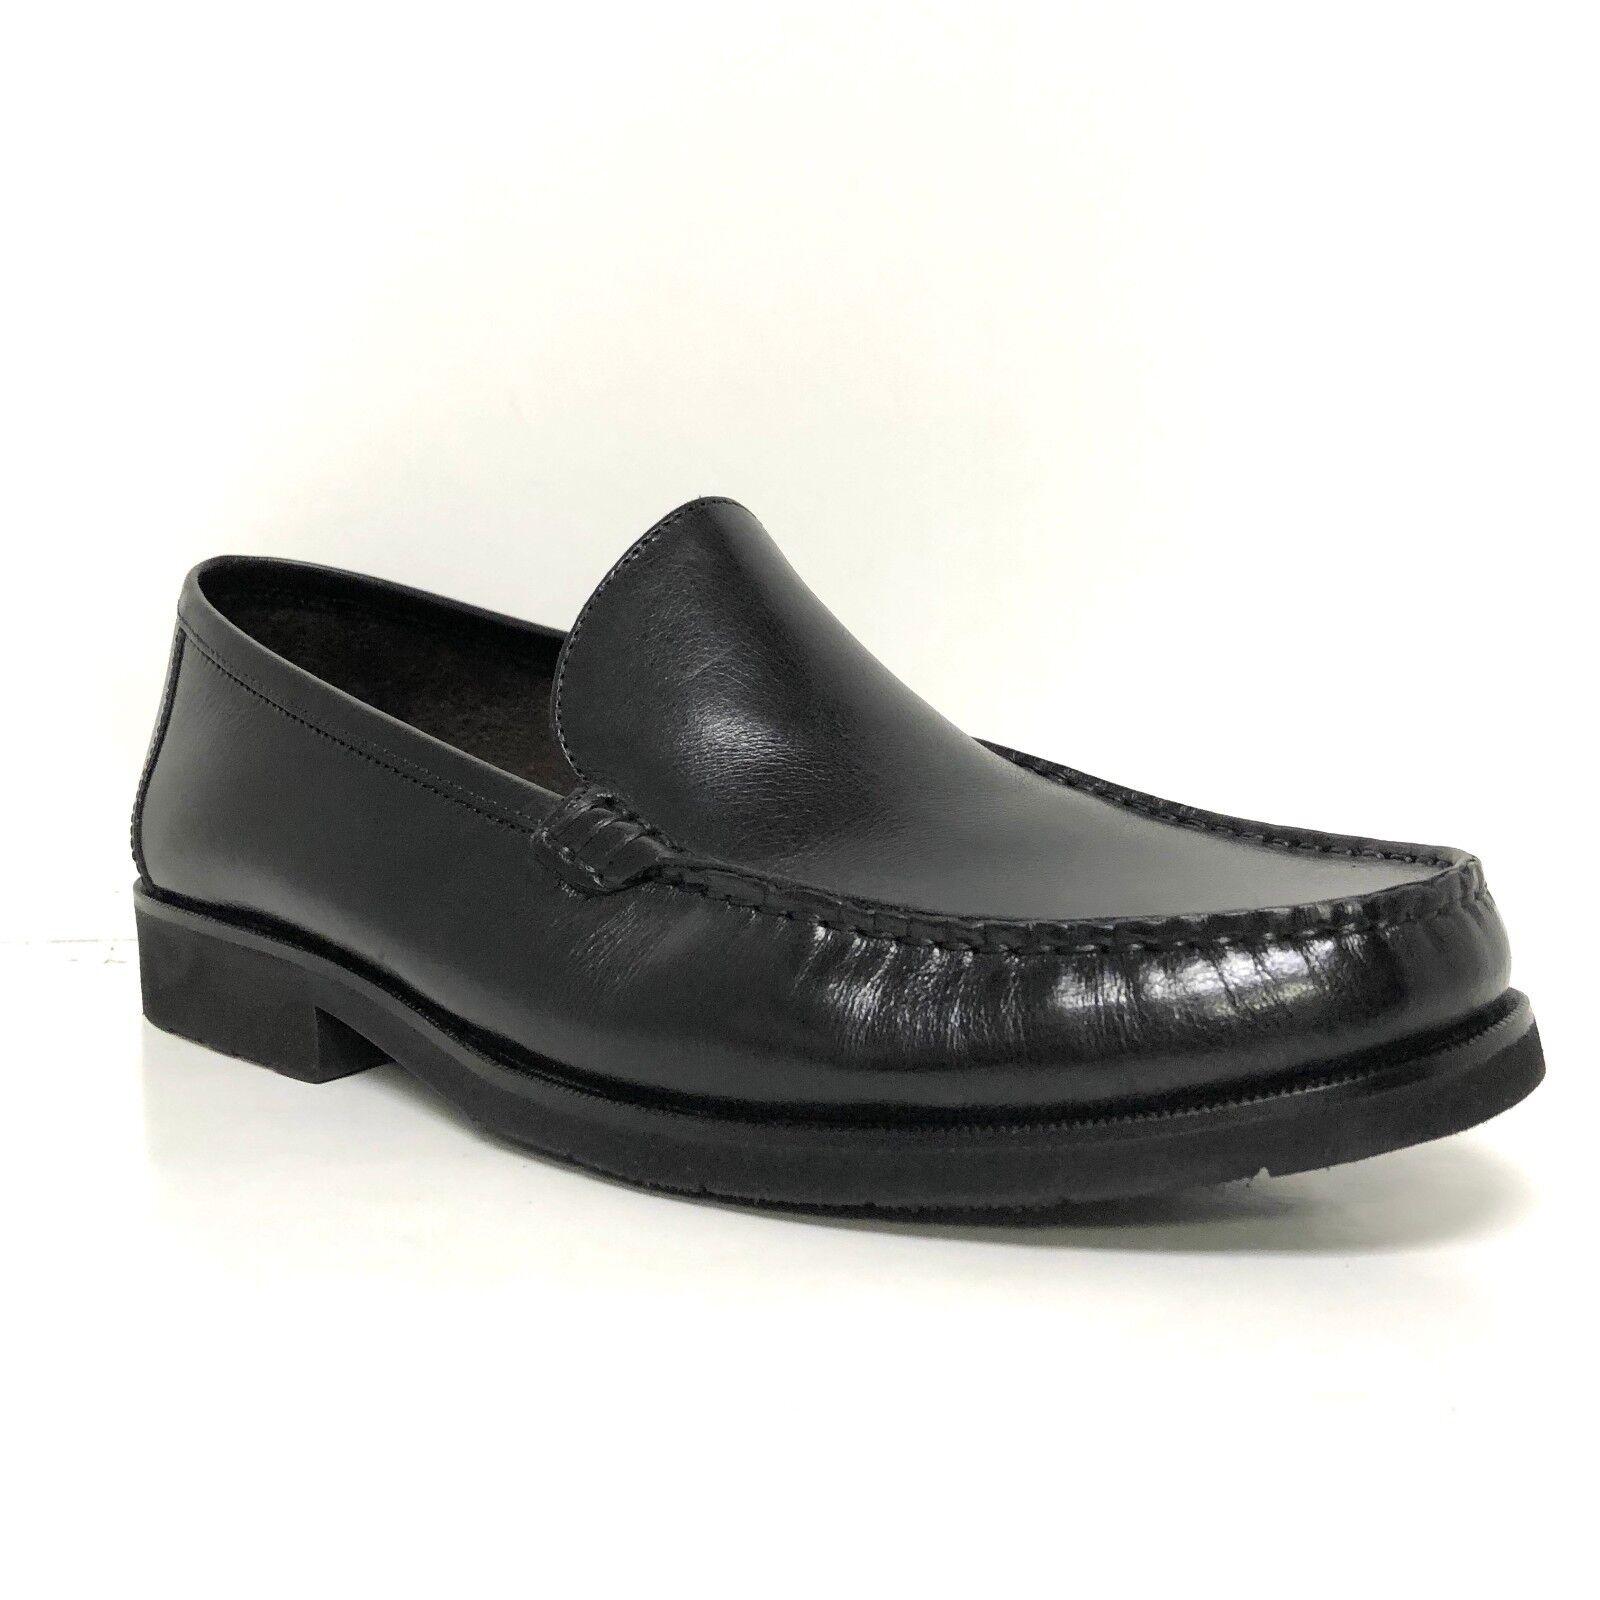 Florsheim Tuscany Venetian Men's Slip On shoes Black Leather Upper 13213001